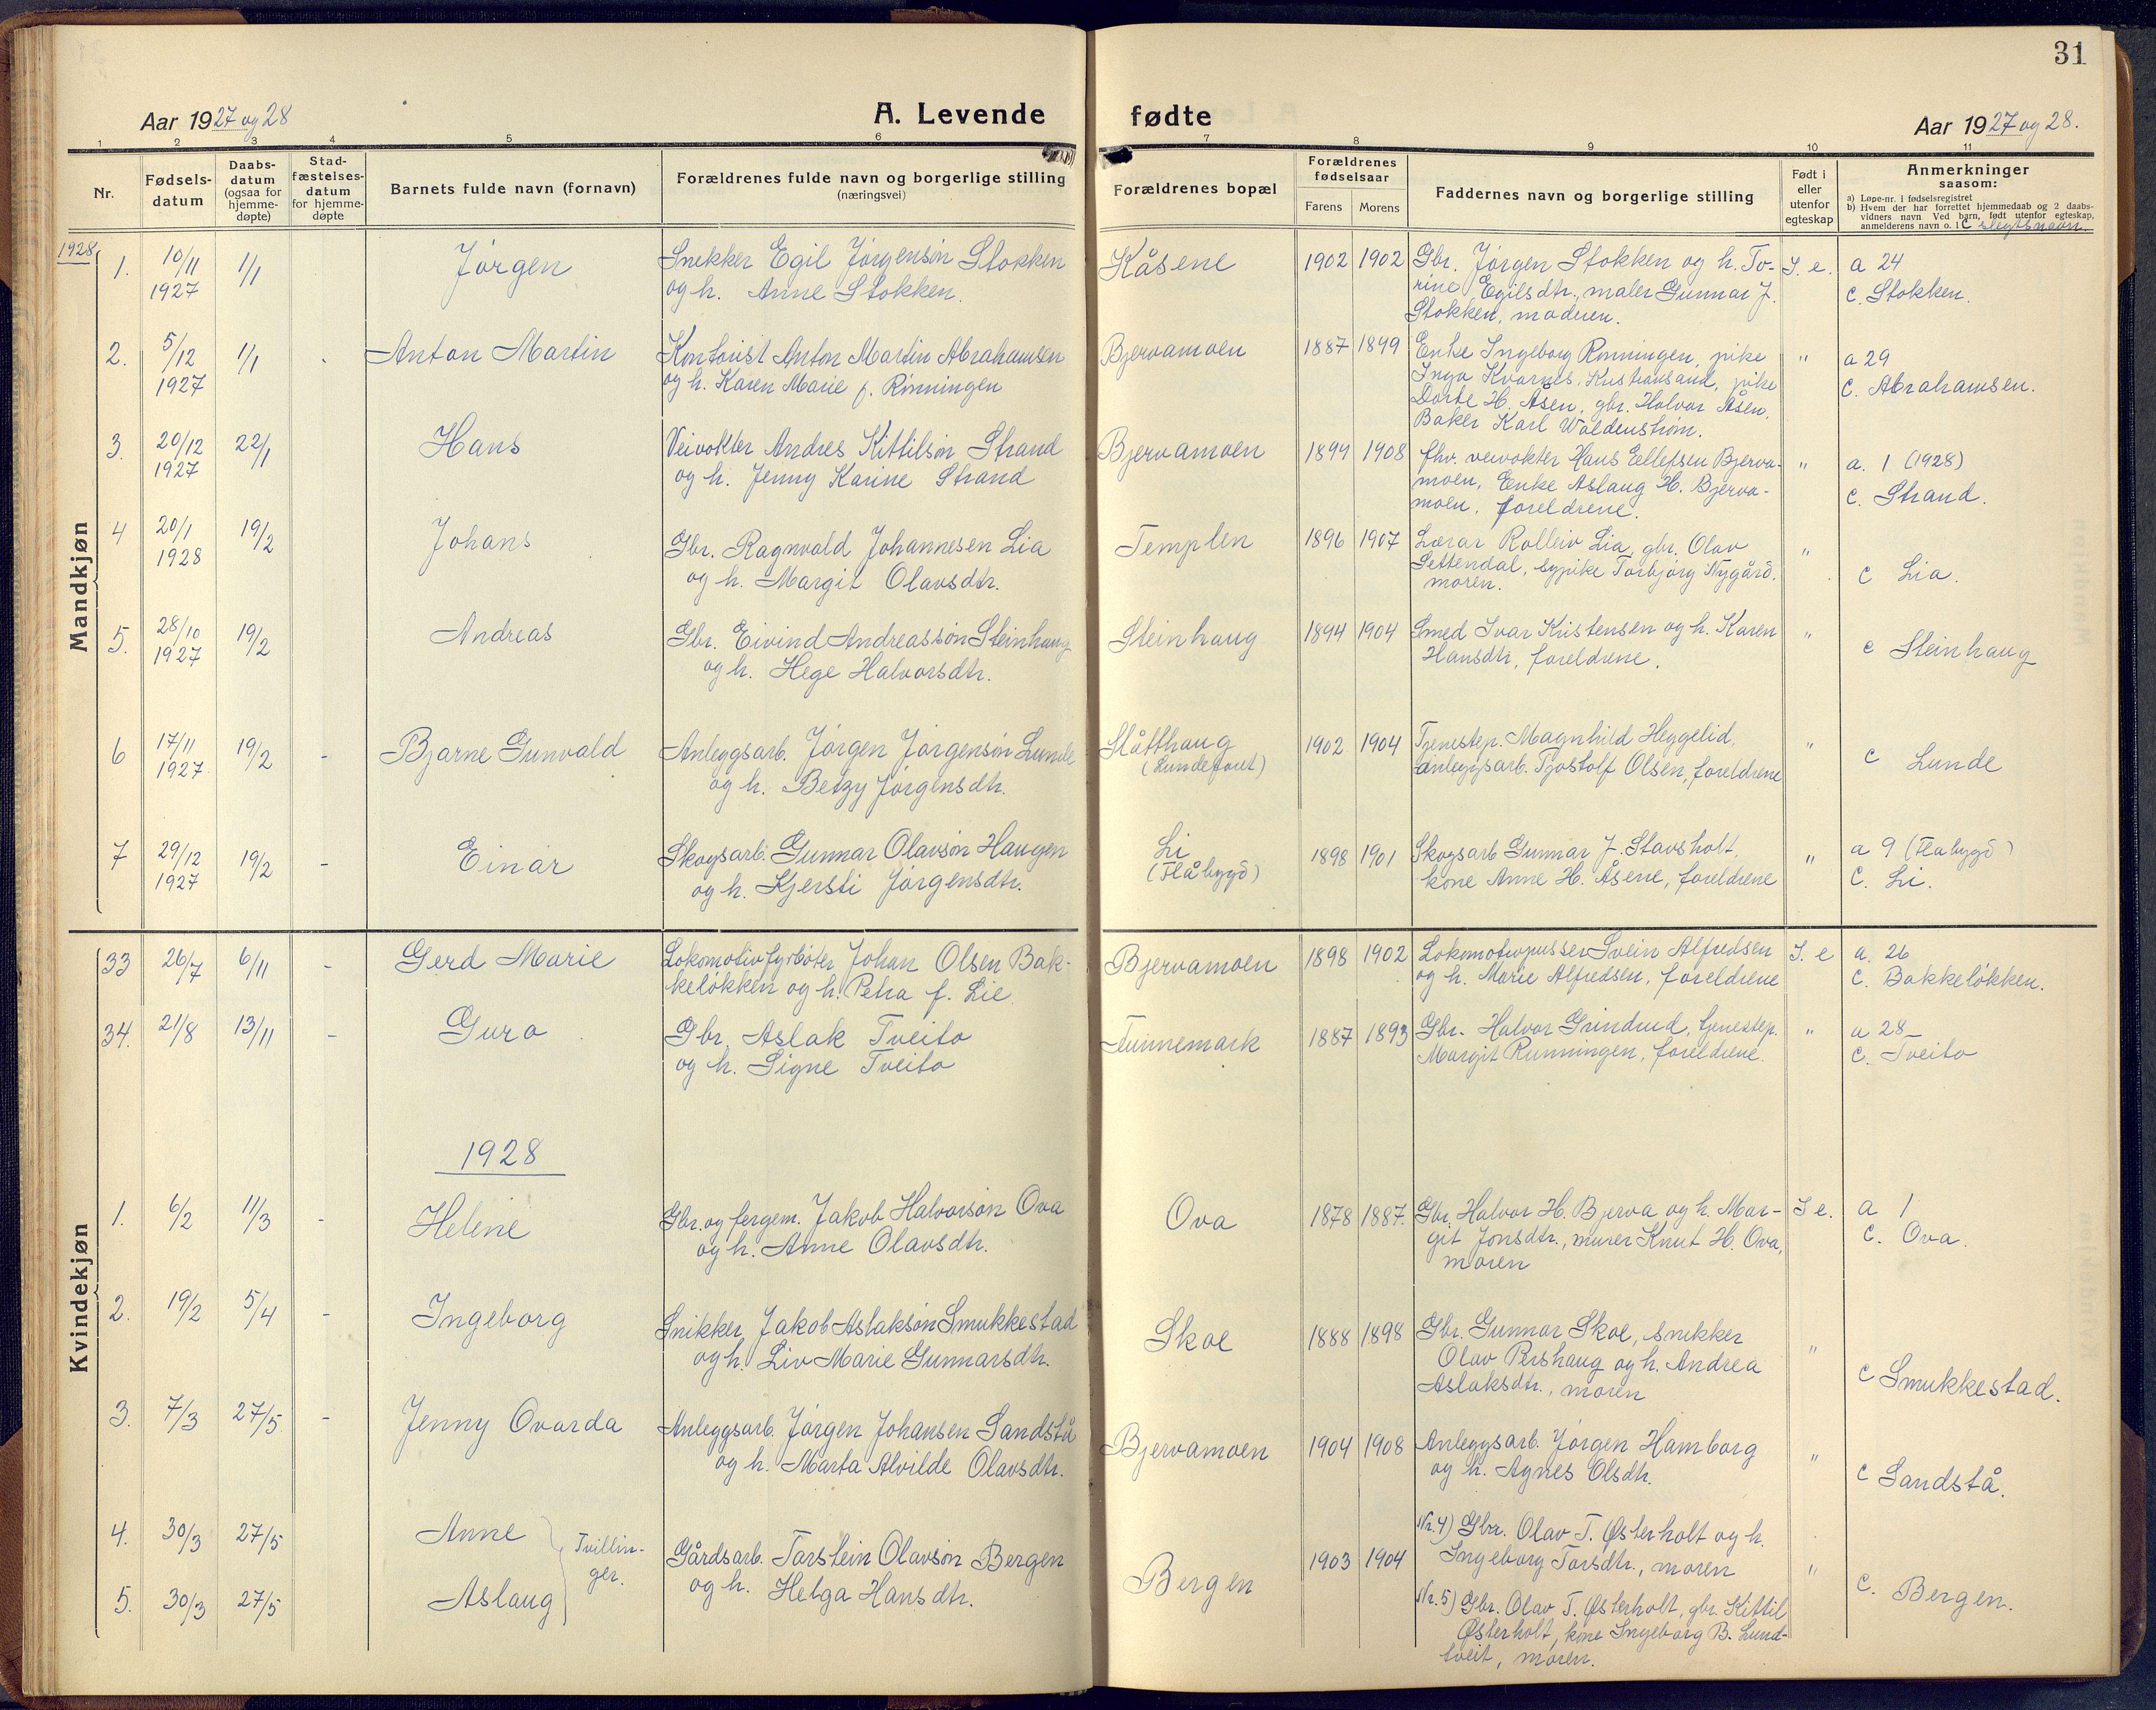 SAKO, Lunde kirkebøker, F/Fa/L0006: Ministerialbok nr. I 6, 1922-1940, s. 31